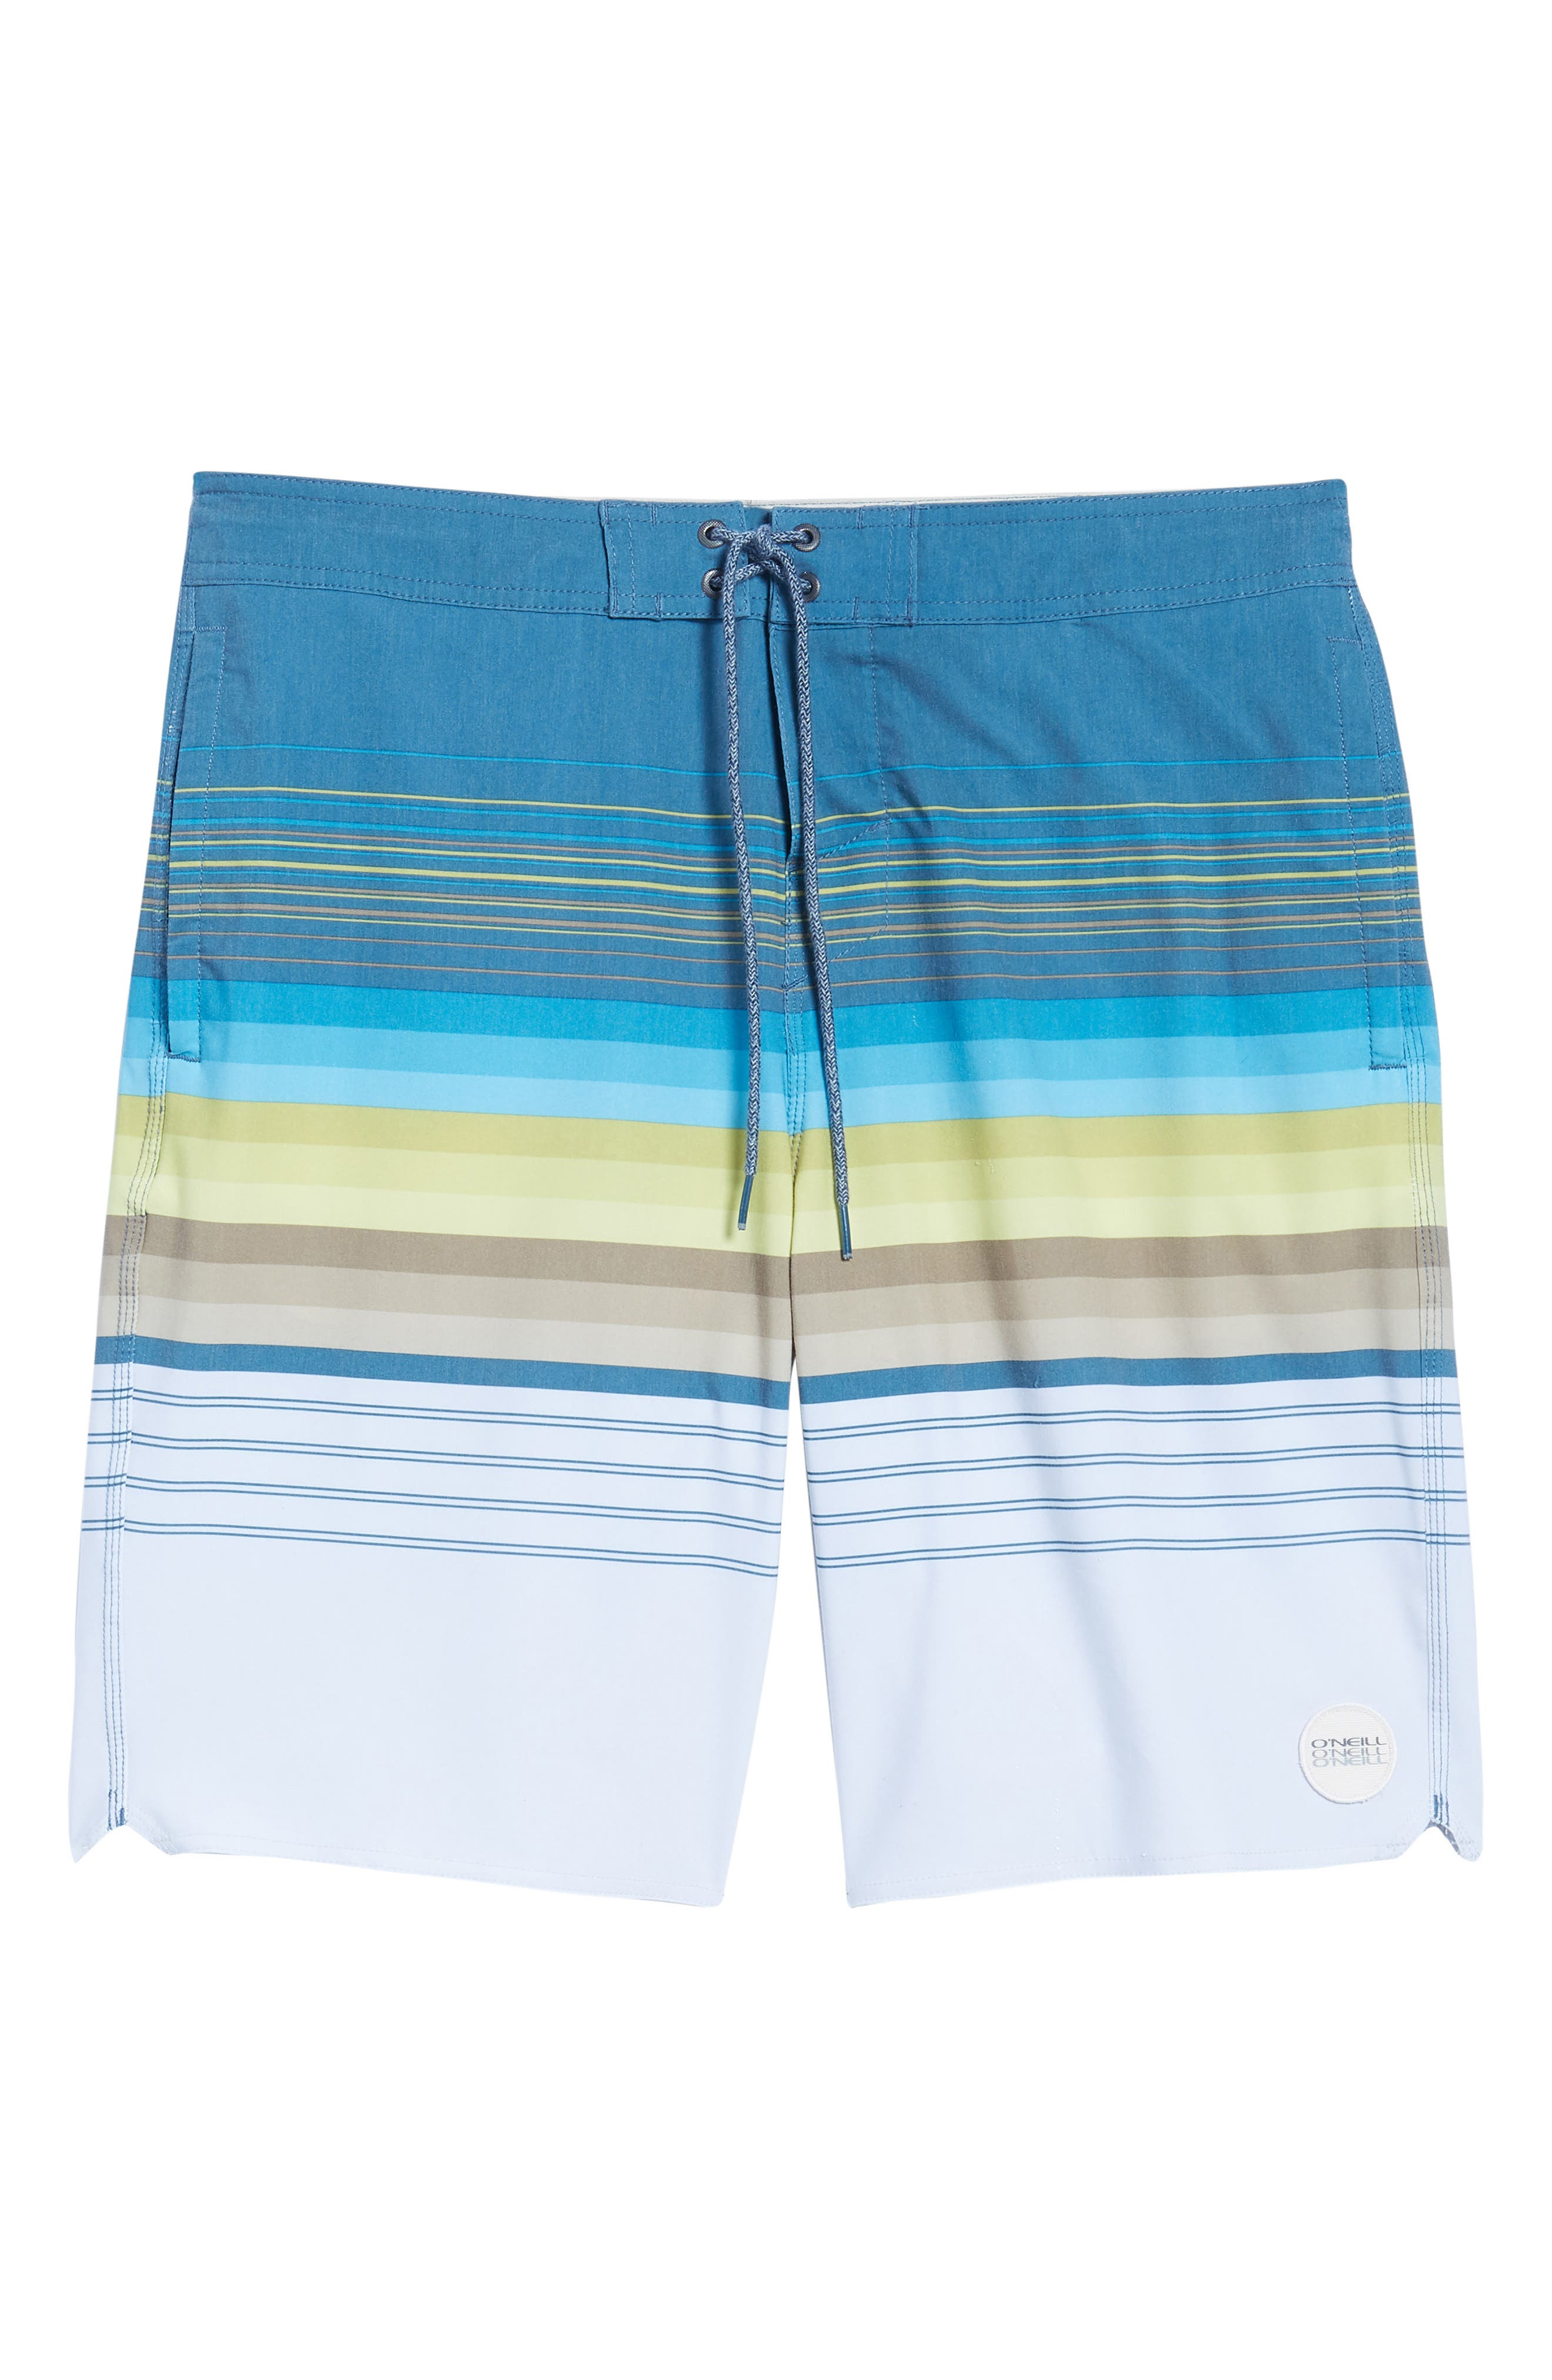 Sandbar Cruzer Board Shorts,                             Alternate thumbnail 6, color,                             Fog